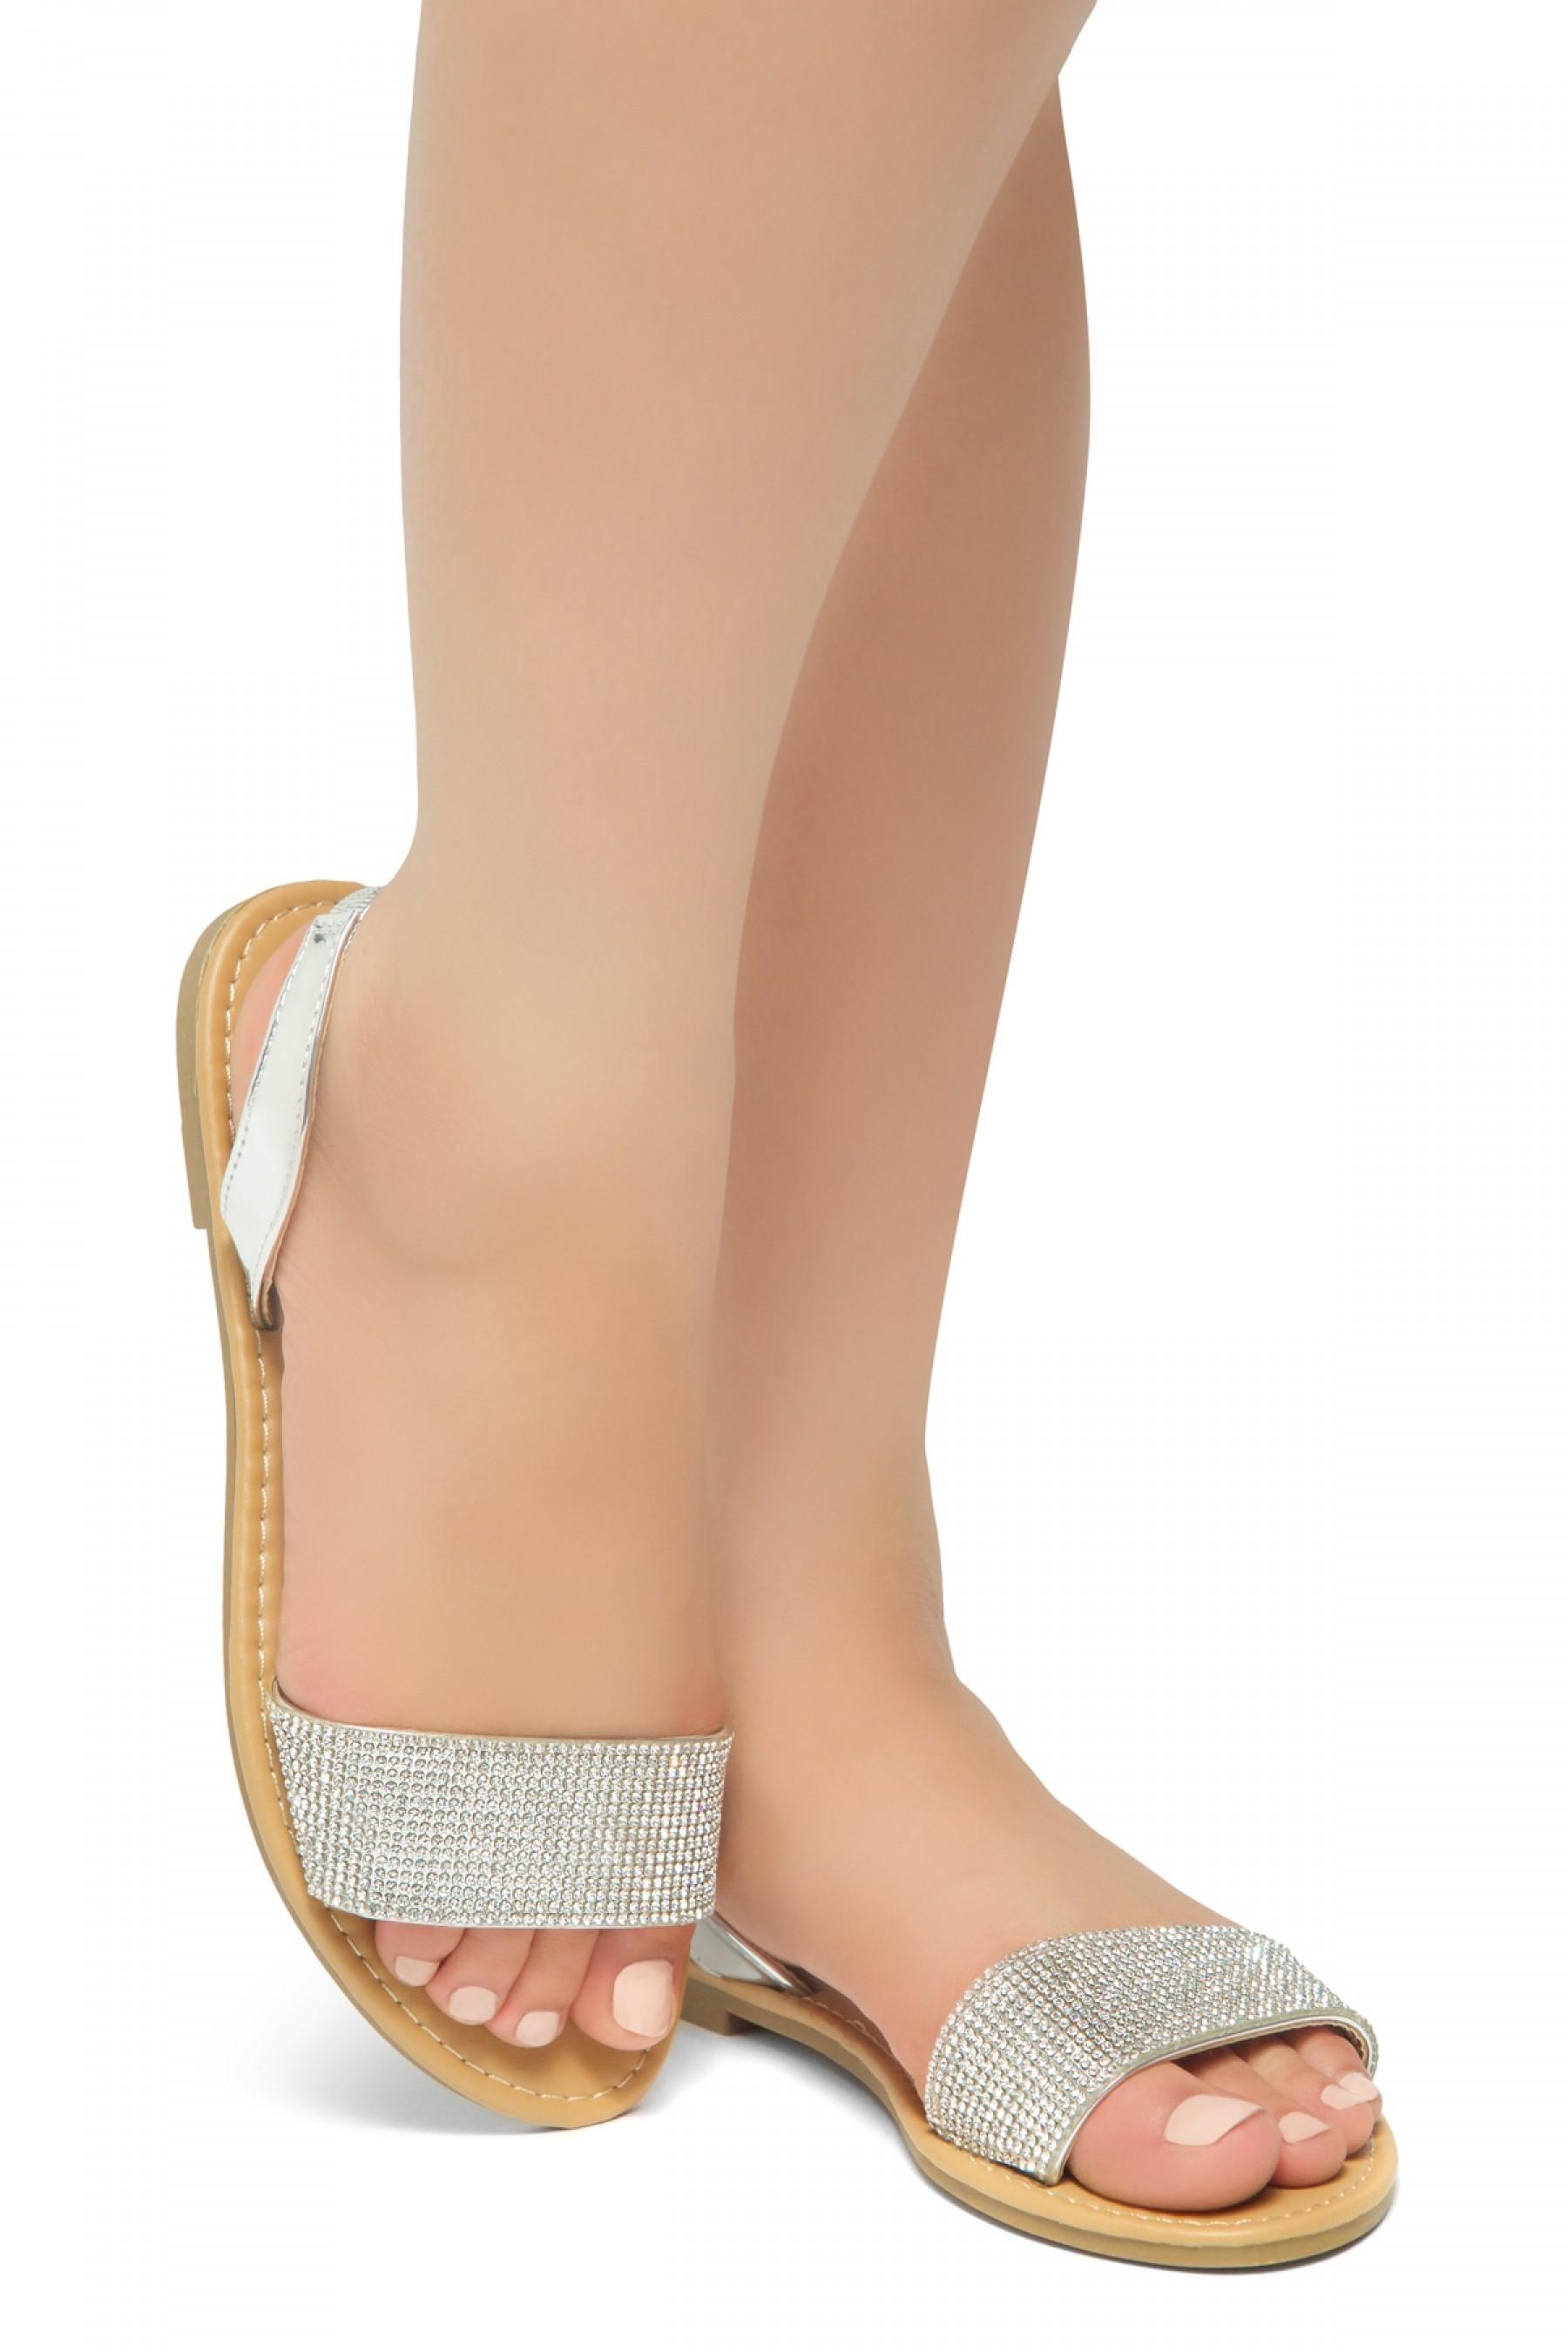 HerStyle Women's Manmade Pretty Nice Slip-On Rhinestone Vamp Sandals  (Silver)